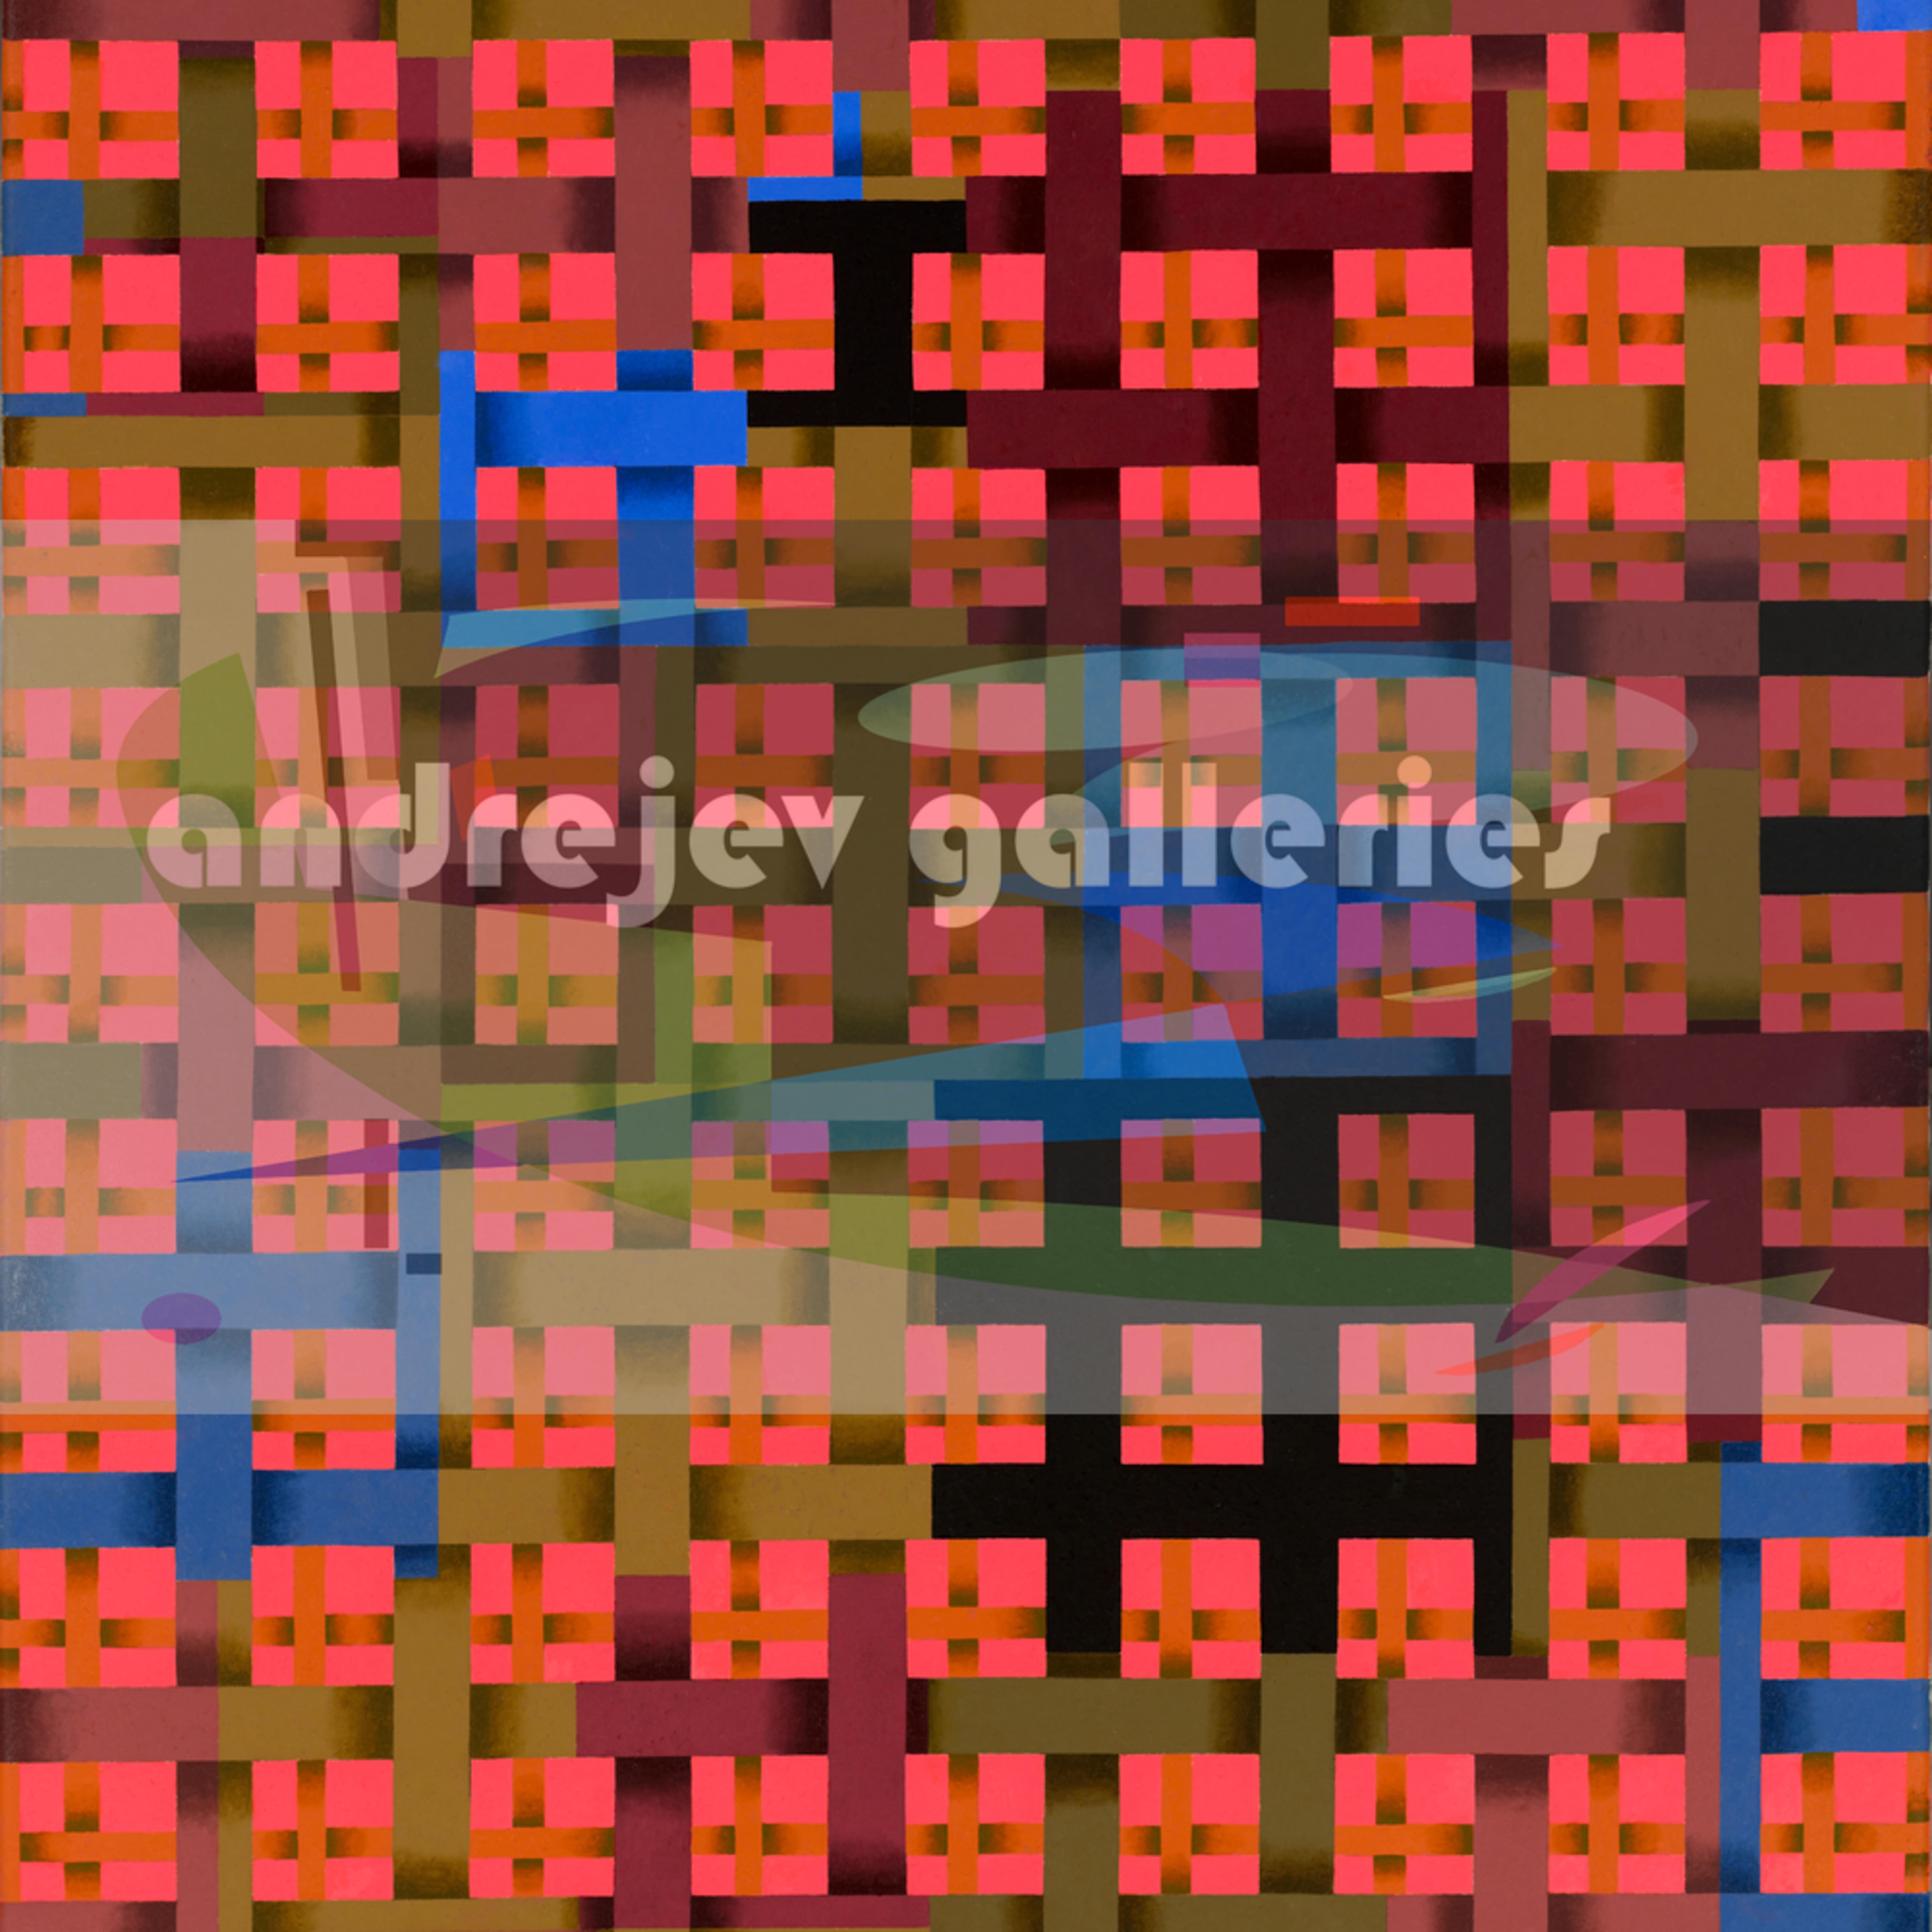 0006 mayo geneology 2016 48x36 oil qb63yk